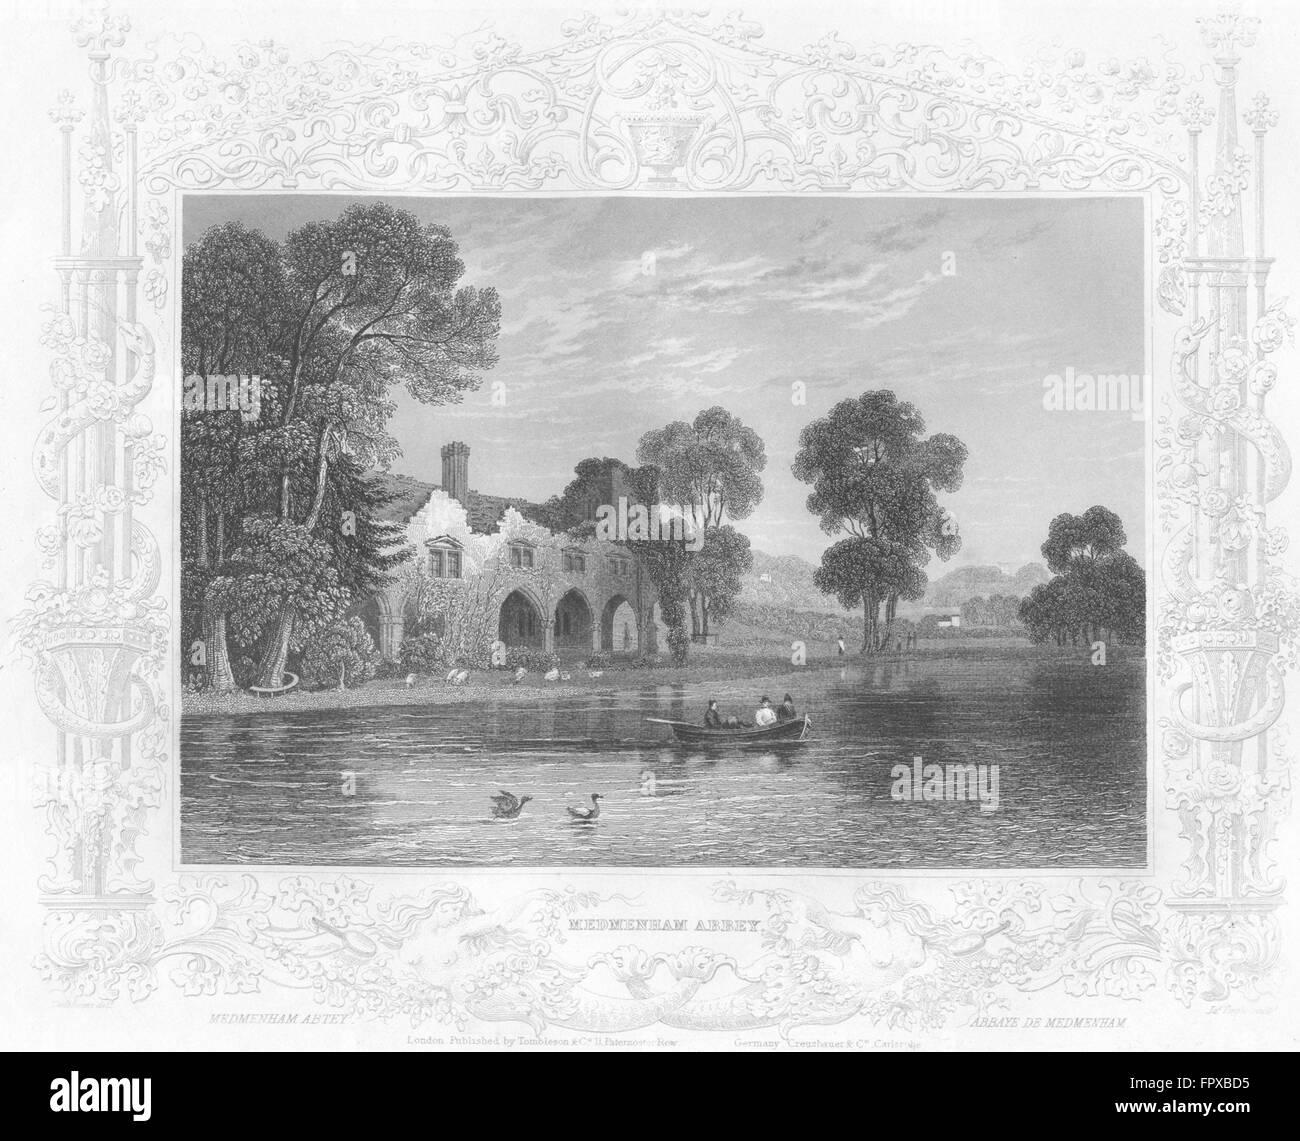 BUCKS: Medmenham Abbey: Tombleson, antique print 1840 Stock Photo